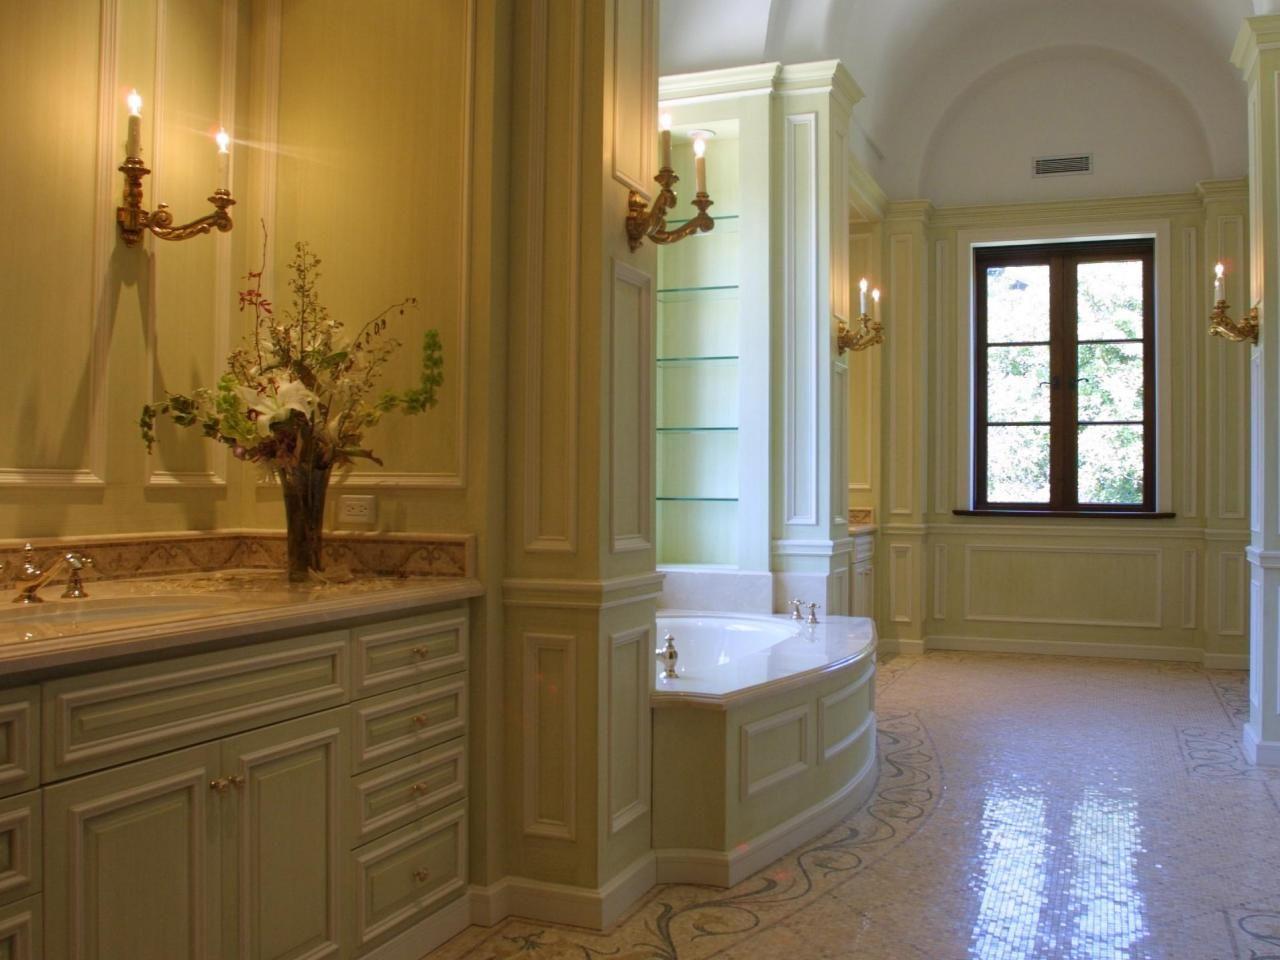 Romantic Bathroom Lighting Ideas | Hgtv, Bath and Master bathrooms